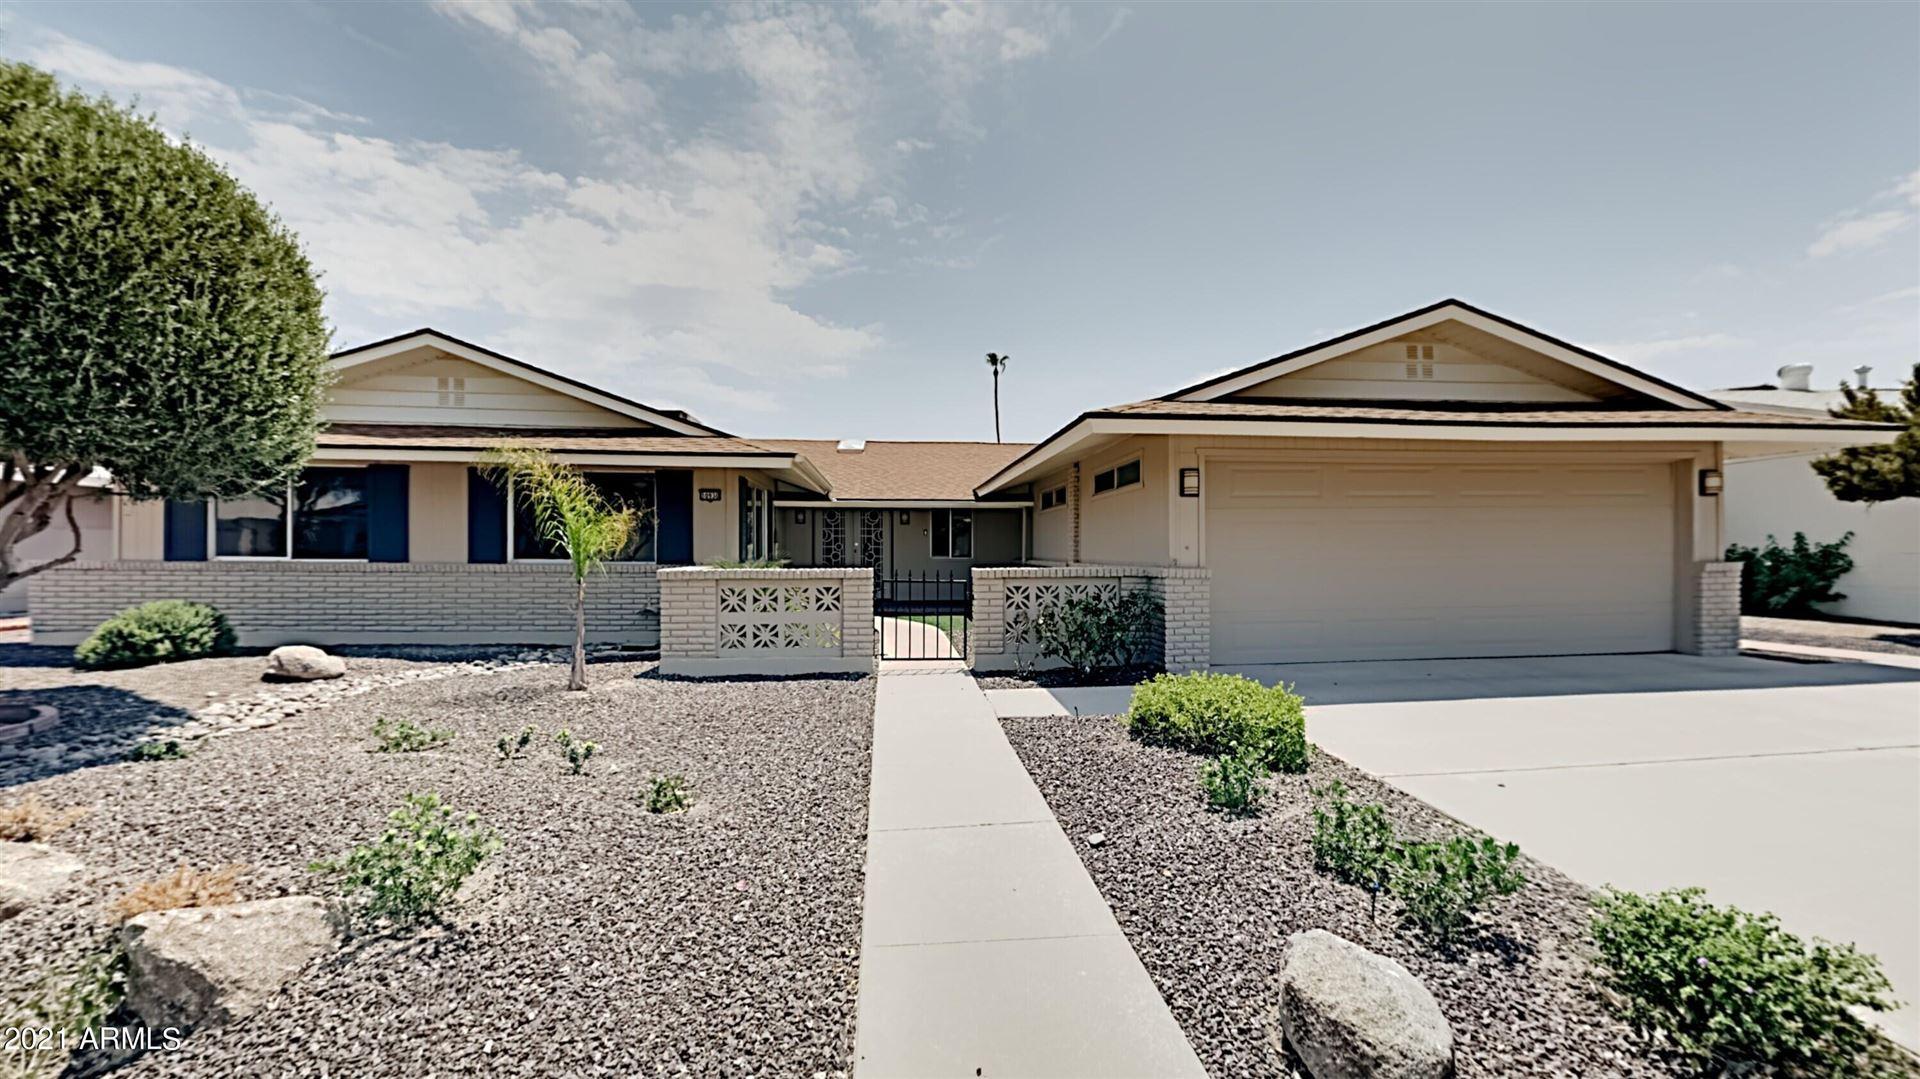 Photo of 10930 W SARATOGA Circle, Sun City, AZ 85351 (MLS # 6268935)